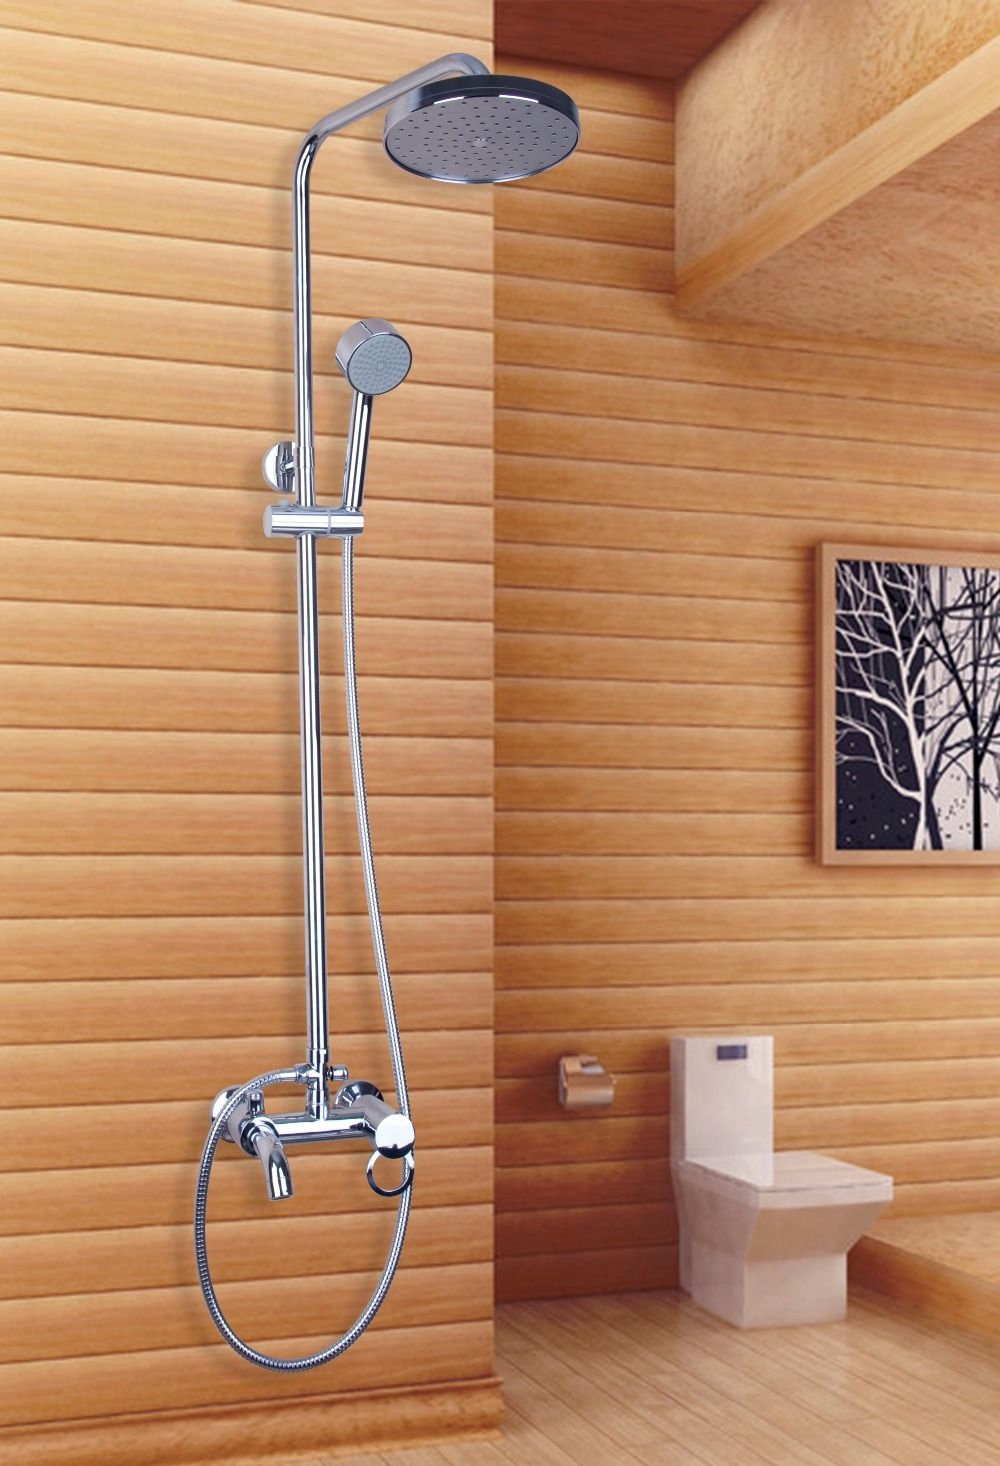 shower heads that connect to bathtub faucet. Shower Murah Berkualitas Kamar Mandi